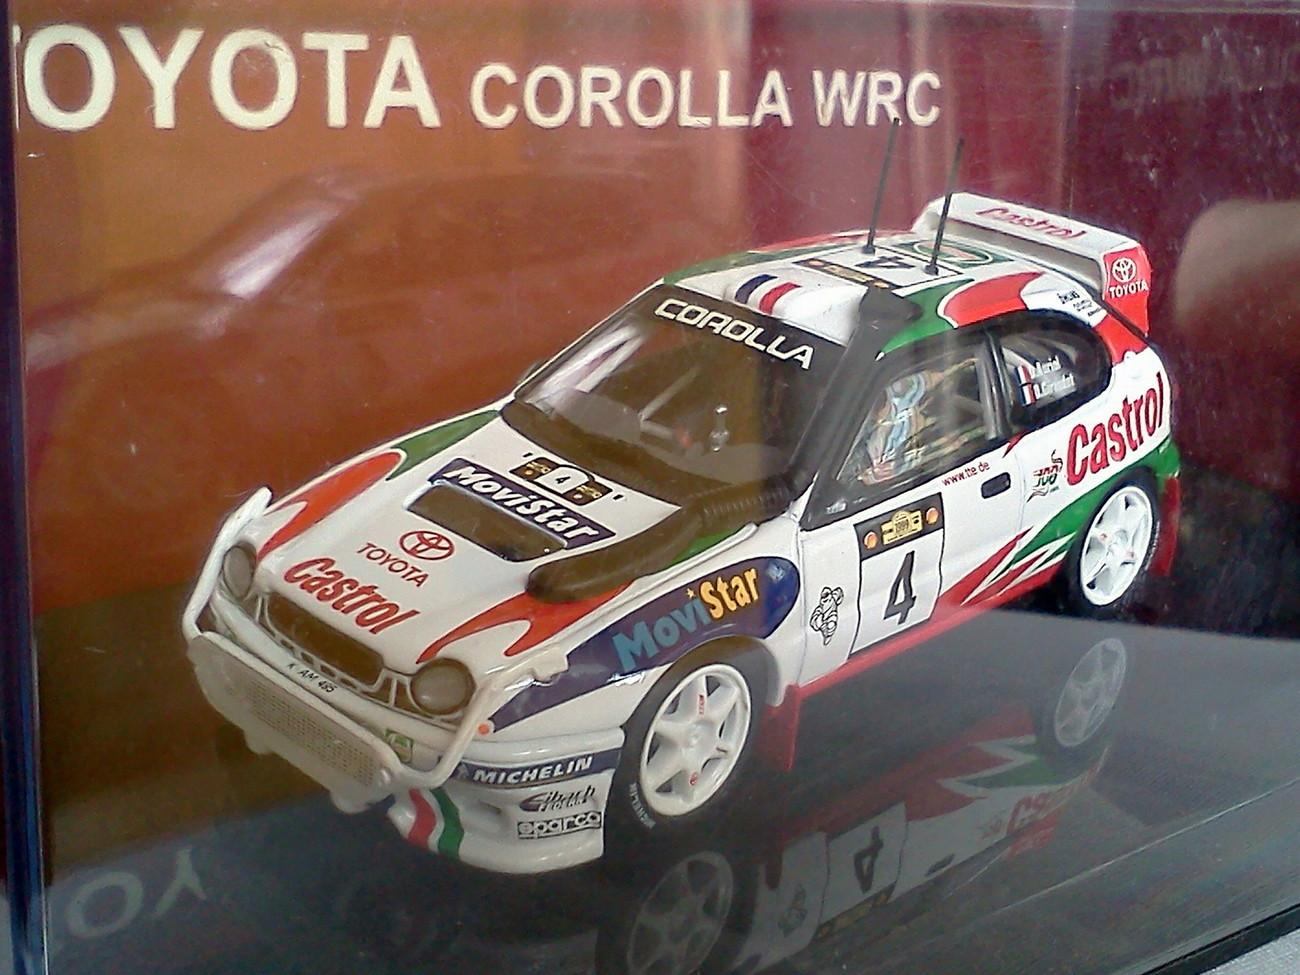 Toyota corolla wrc  4.1